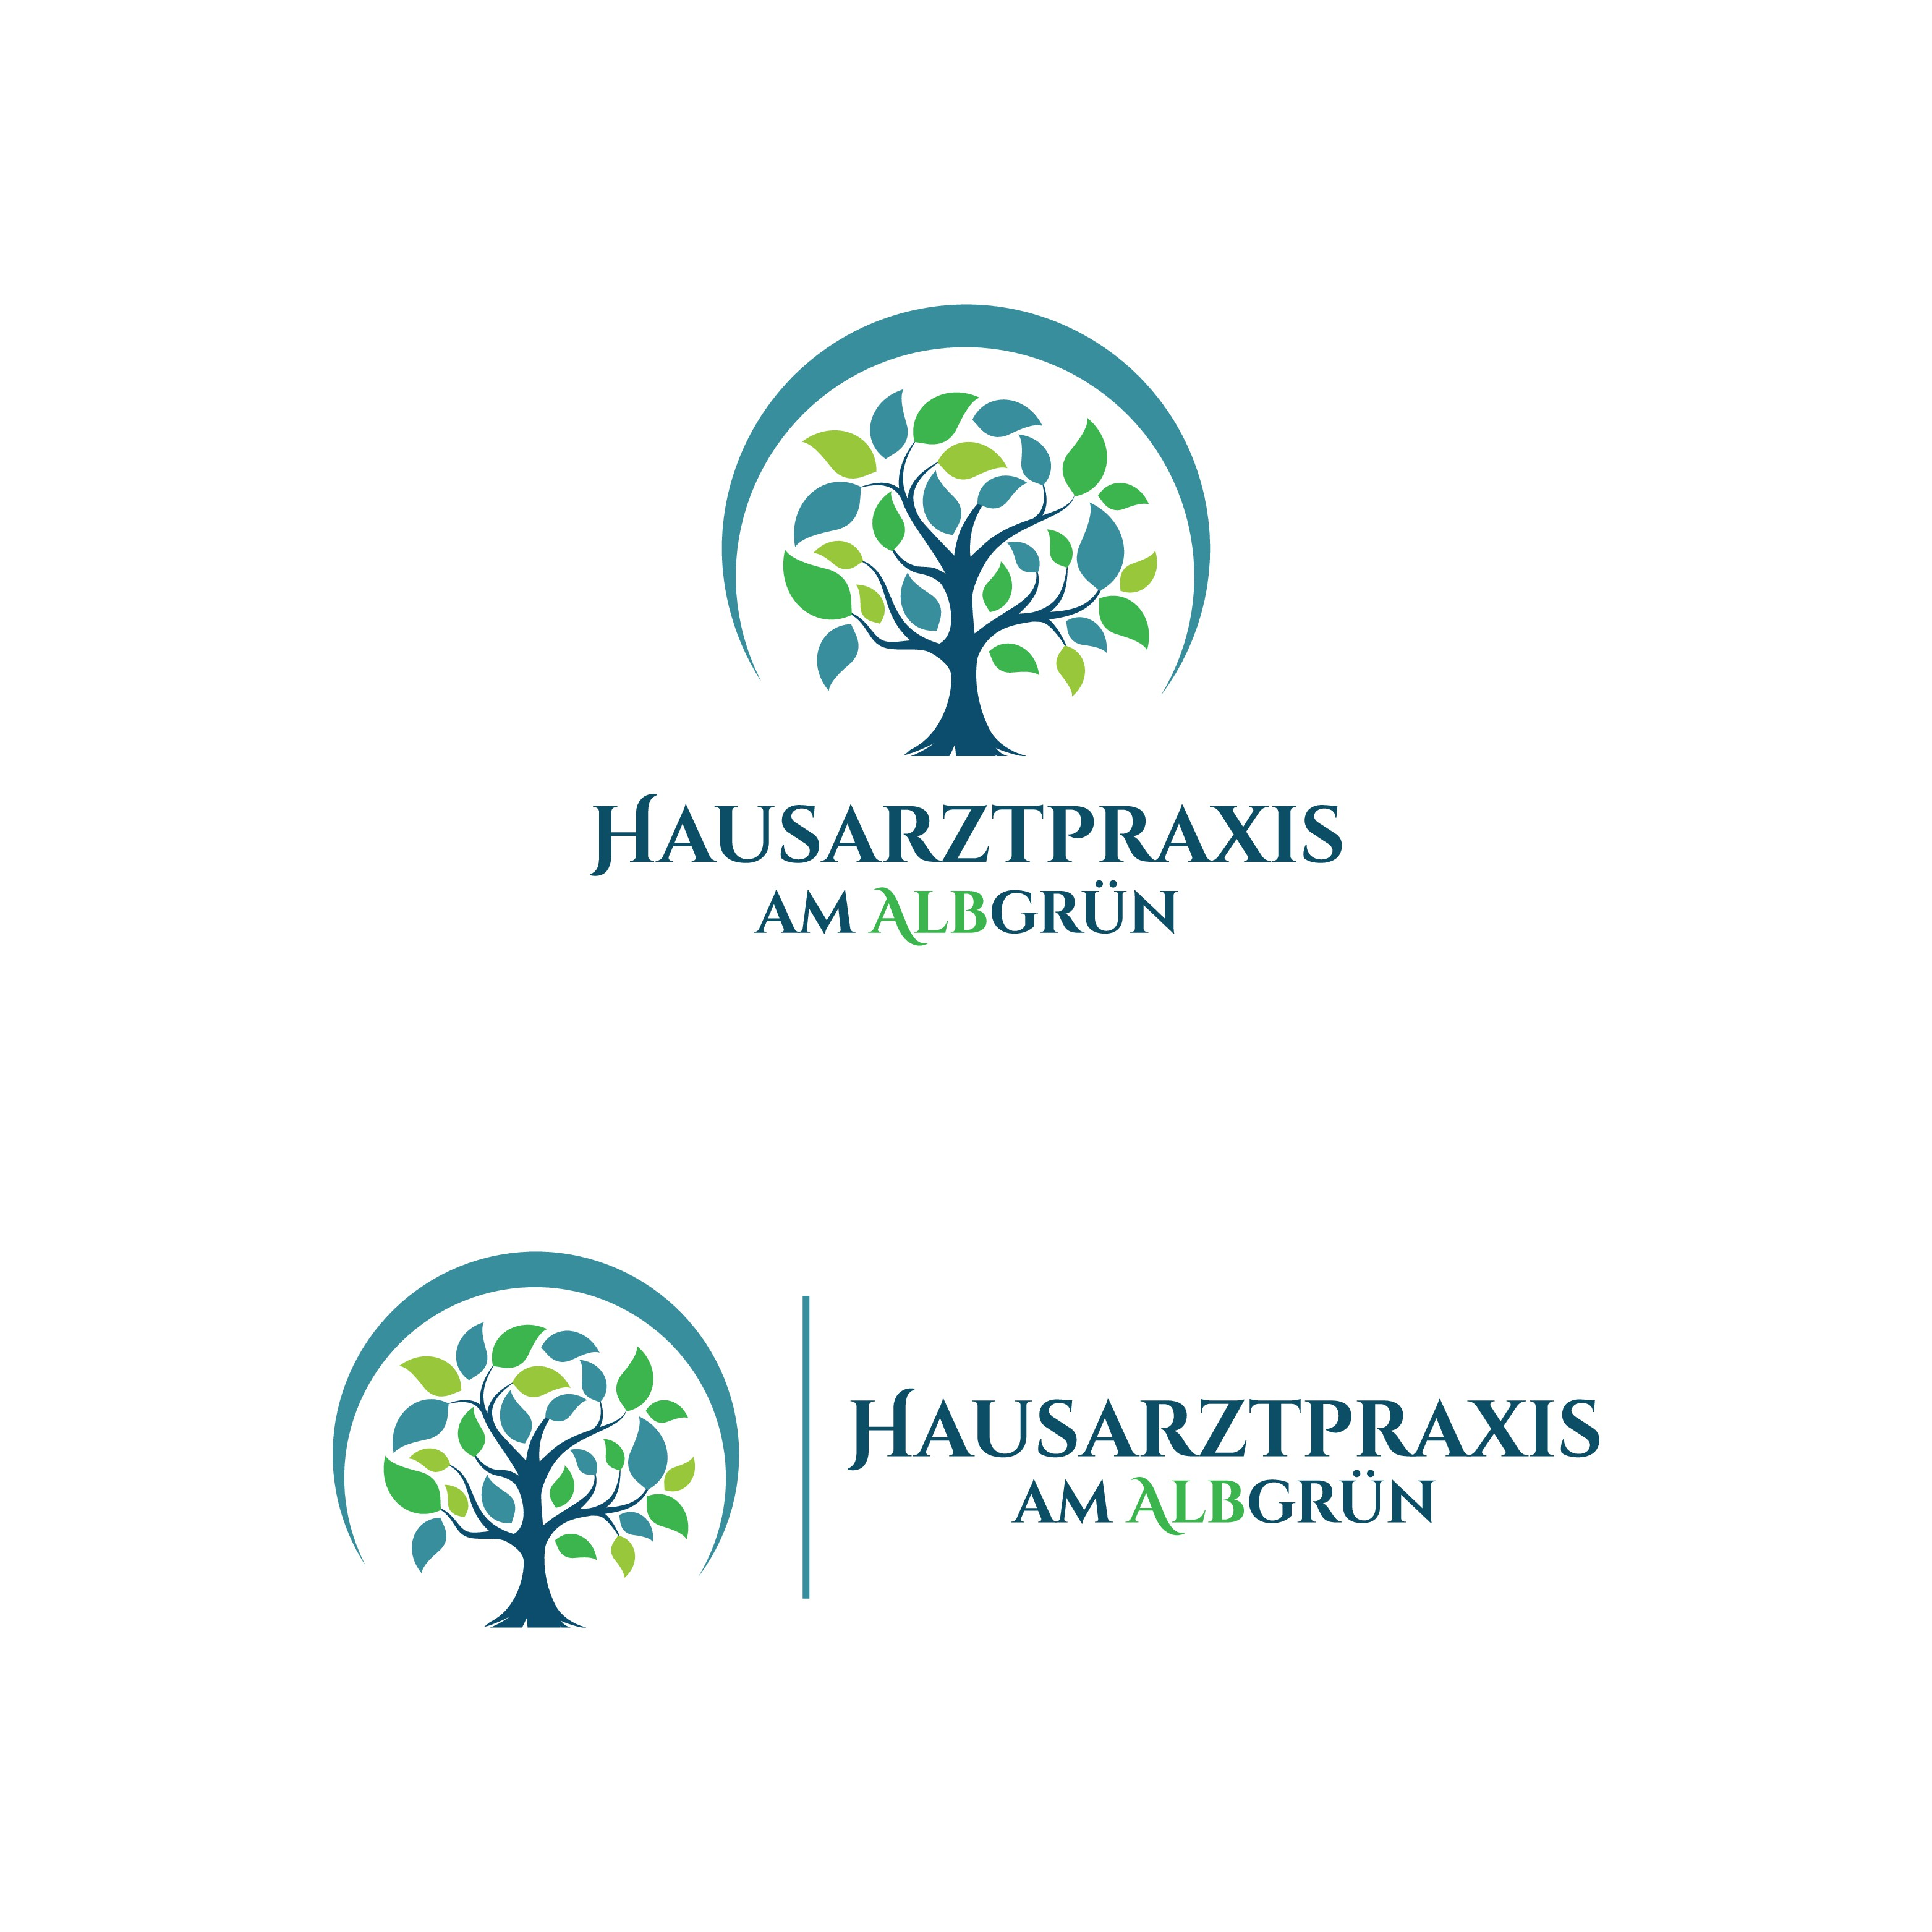 """Hausarztpraxis am Albgrün"" needs fine design"